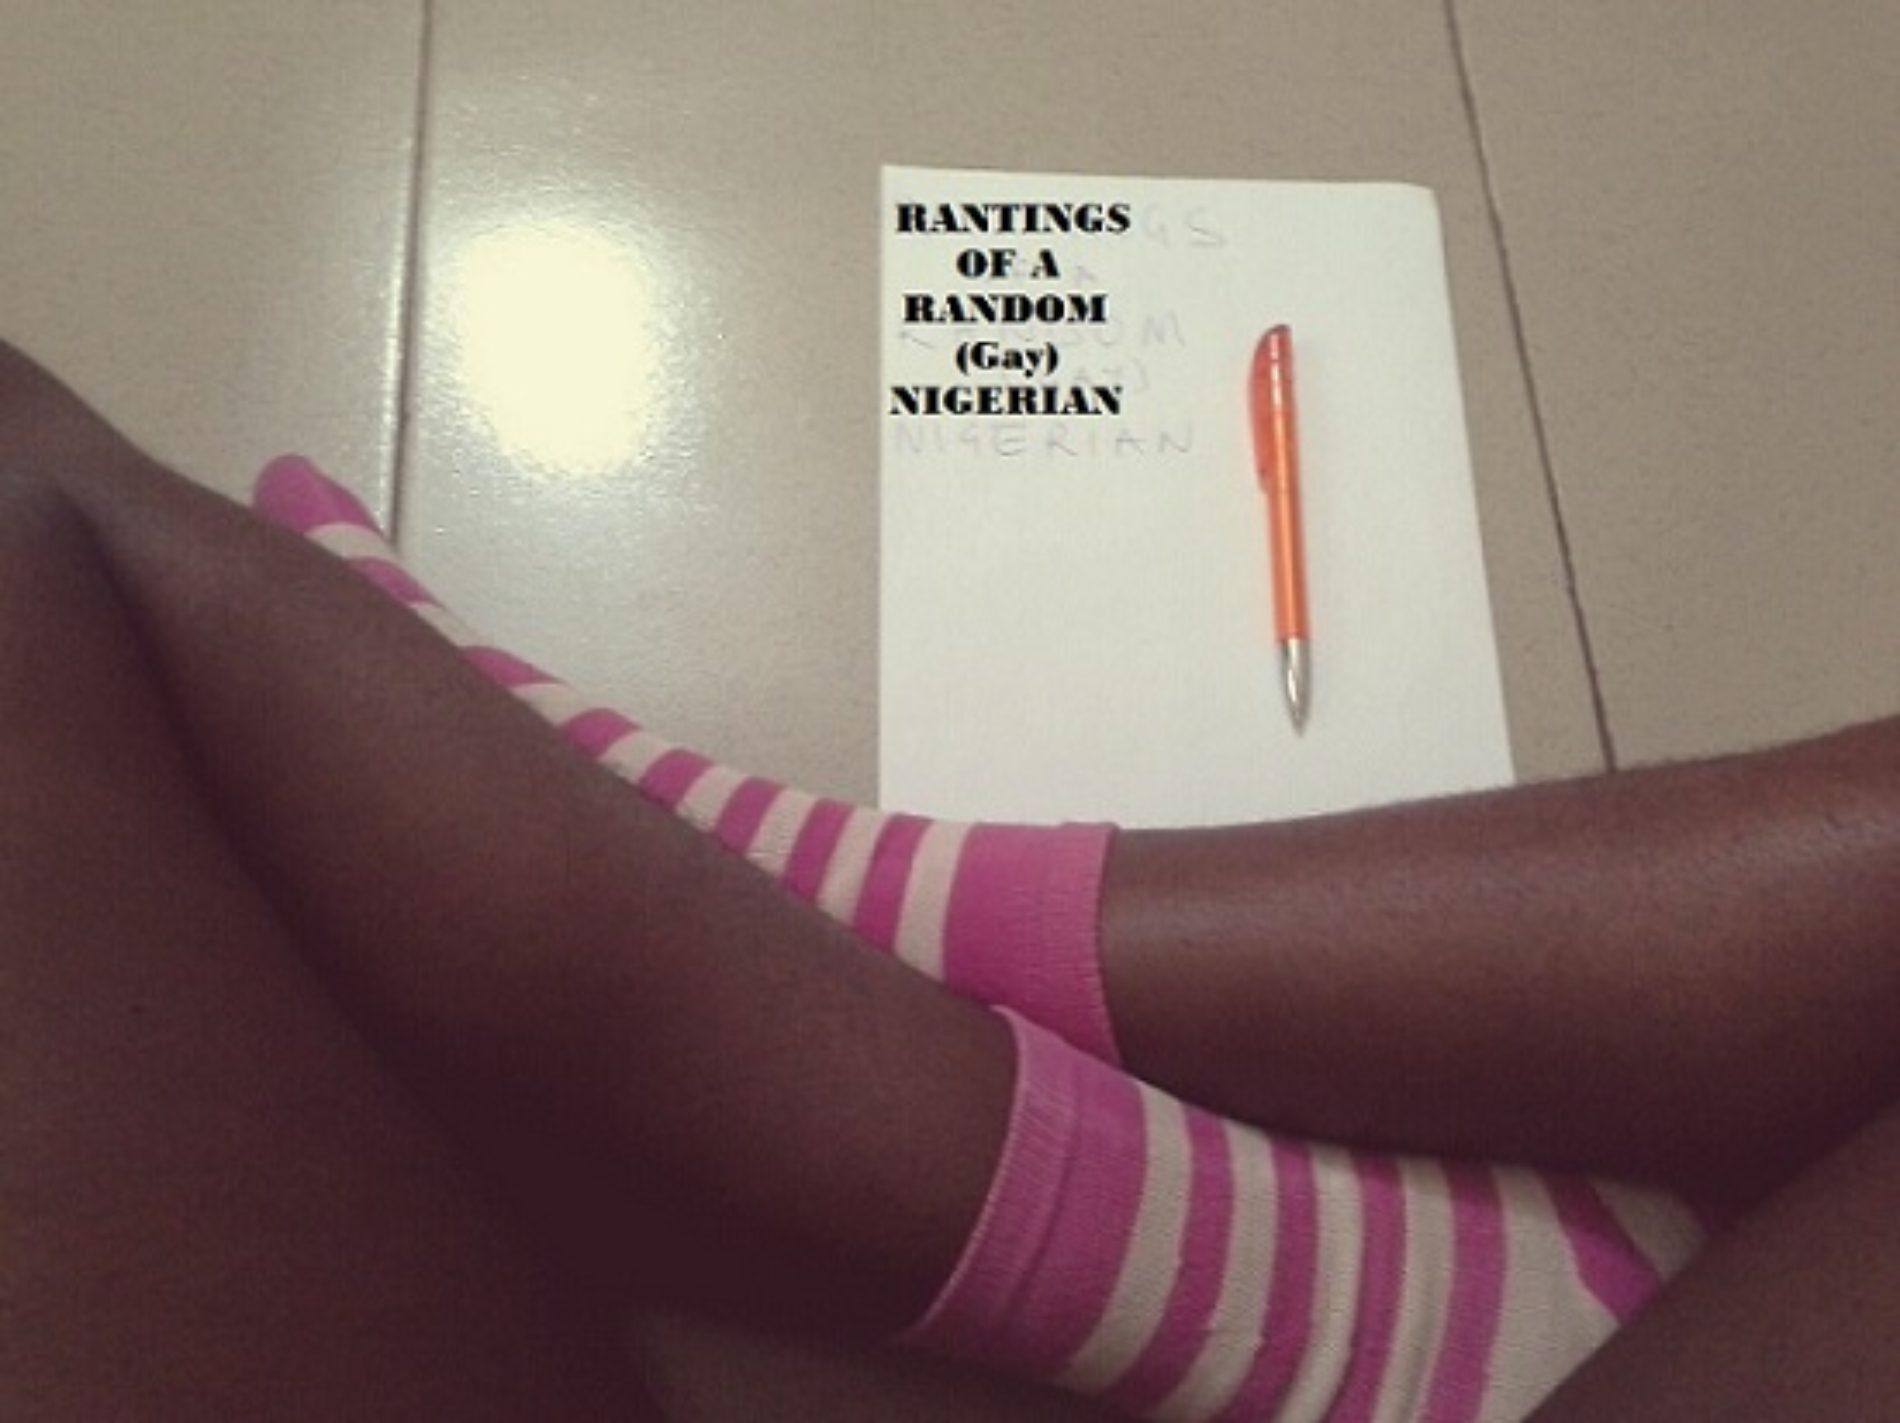 RANTINGS OF A RANDOM (Gay) NIGERIAN (Entry 20)